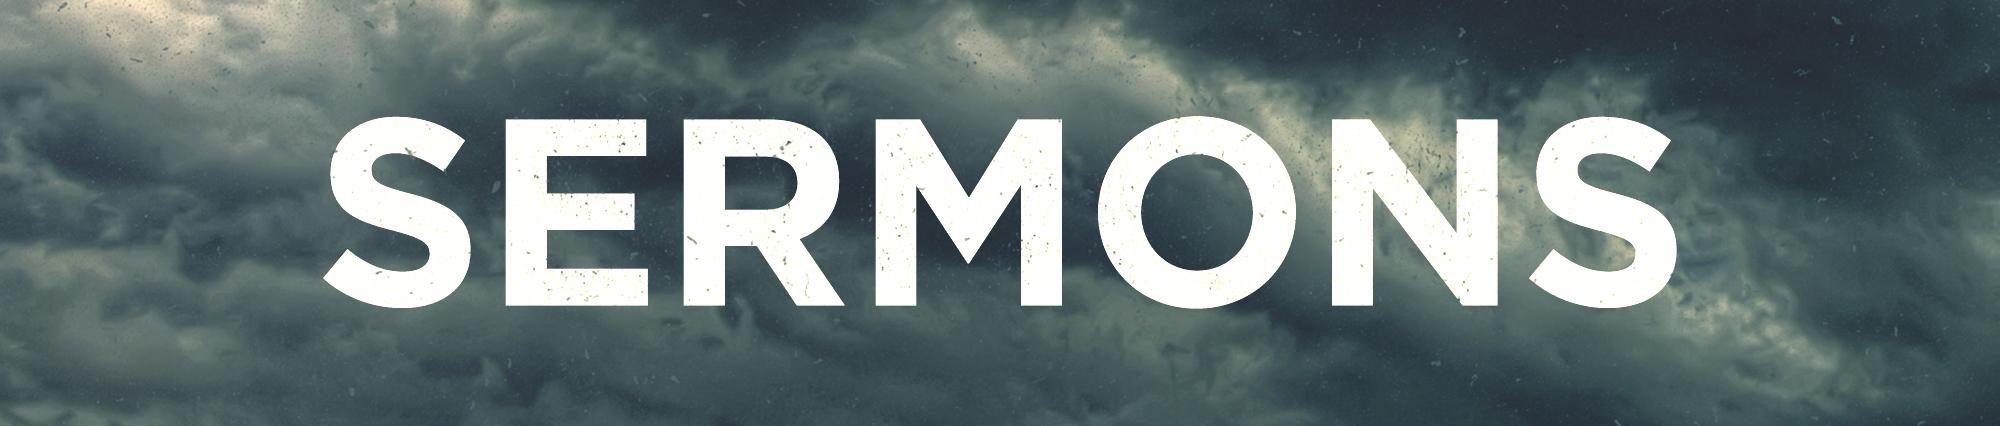 The Storm Sermons.jpg